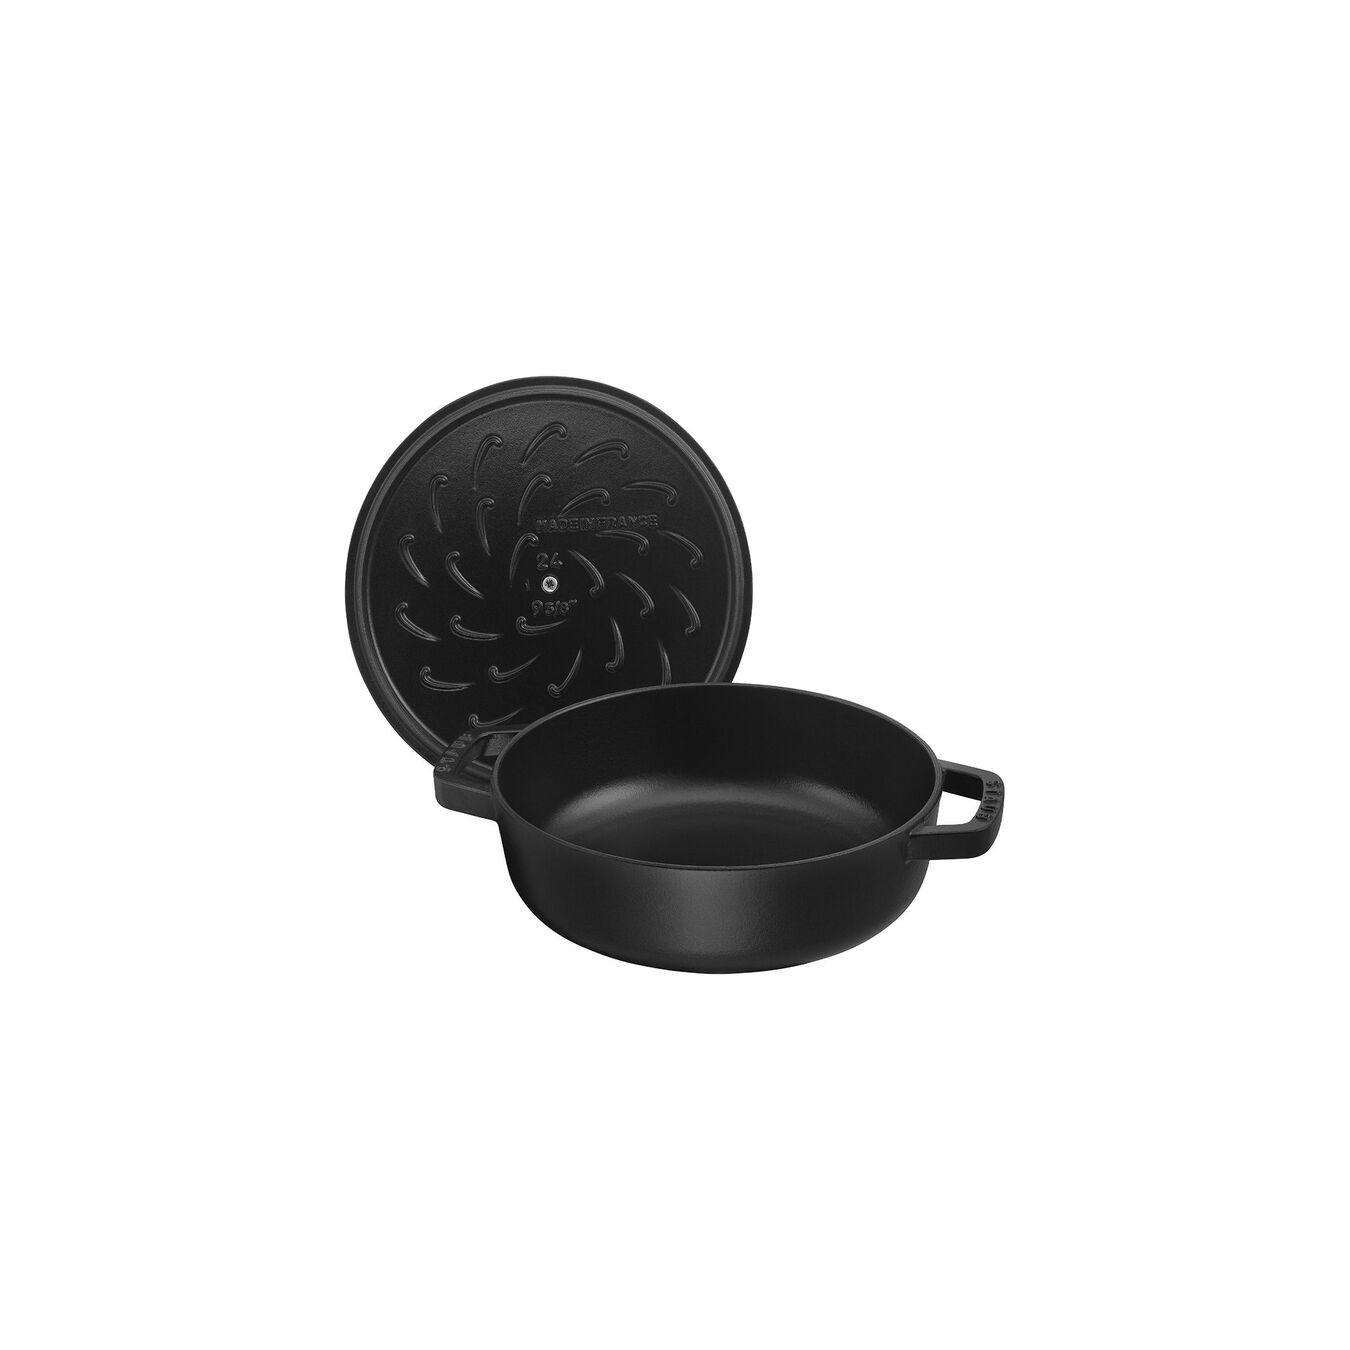 3,75 l Cast iron round Sauteuse Chistera, black,,large 2